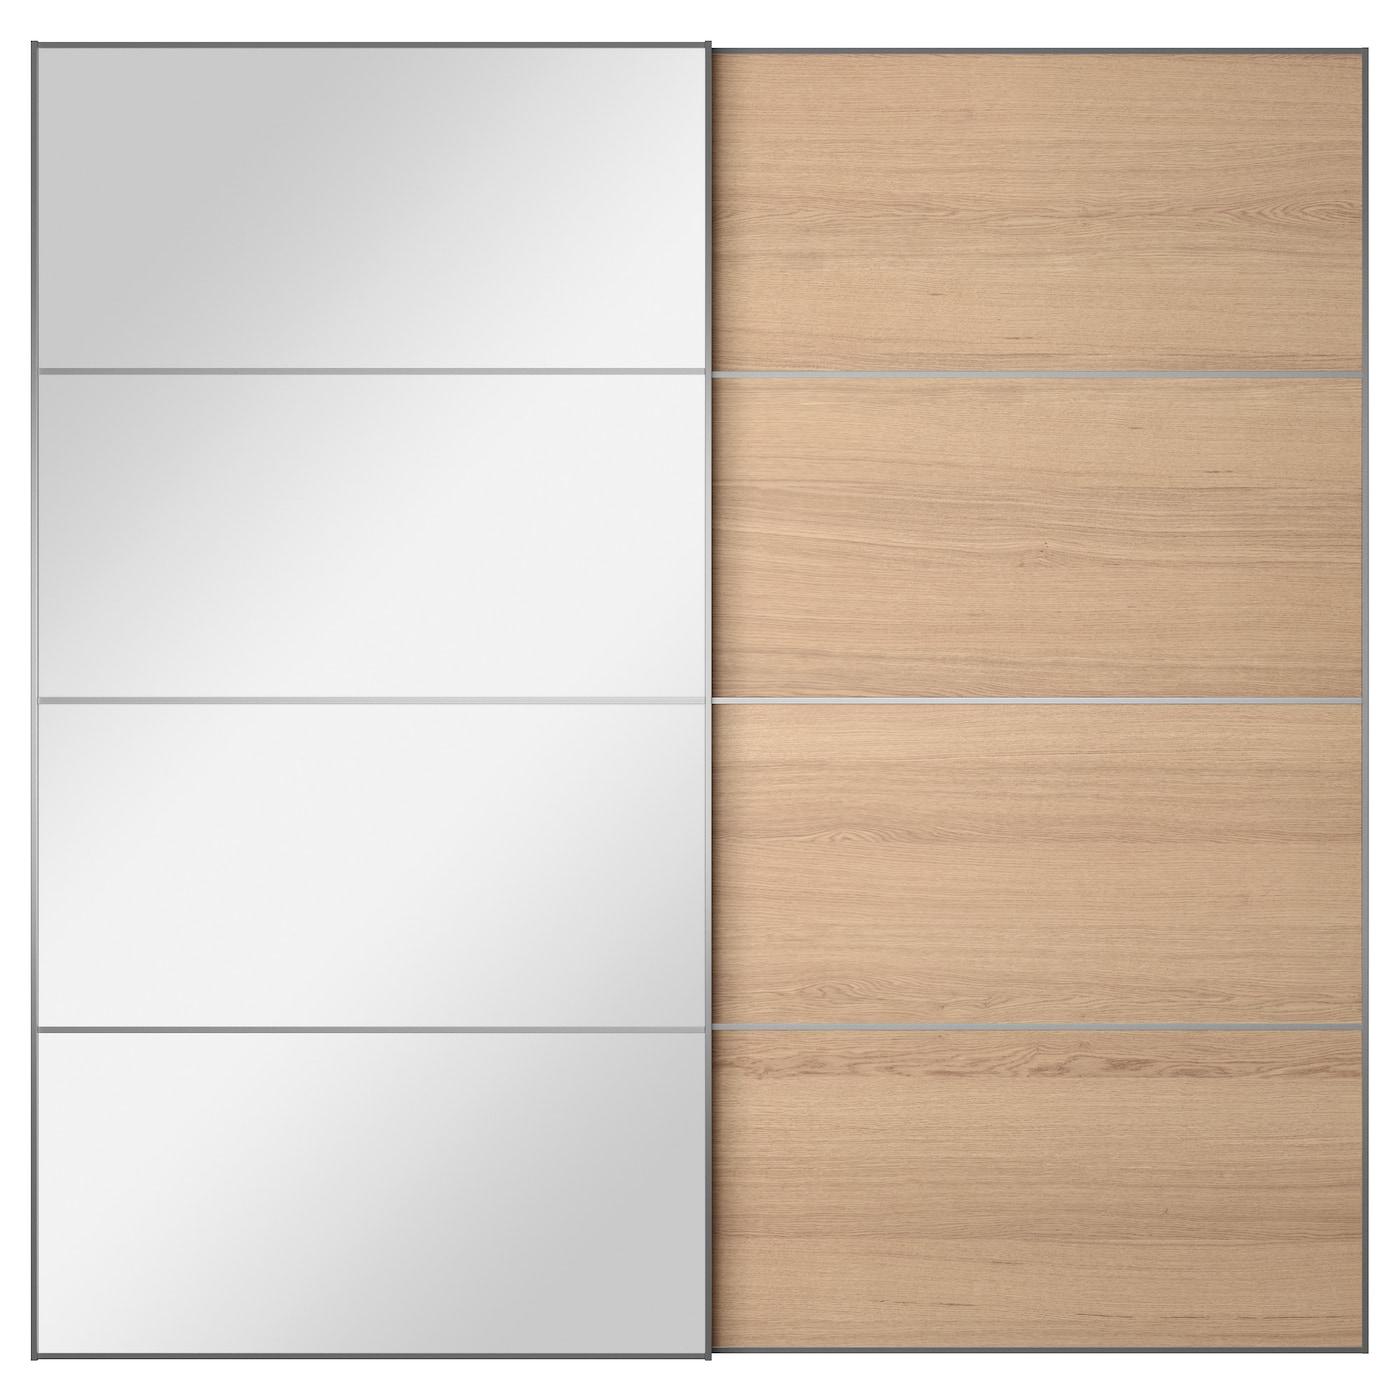 IKEA AULI ILSENG pair of sliding doors. AULI ILSENG Pair of sliding doors Mirror glass white stained oak